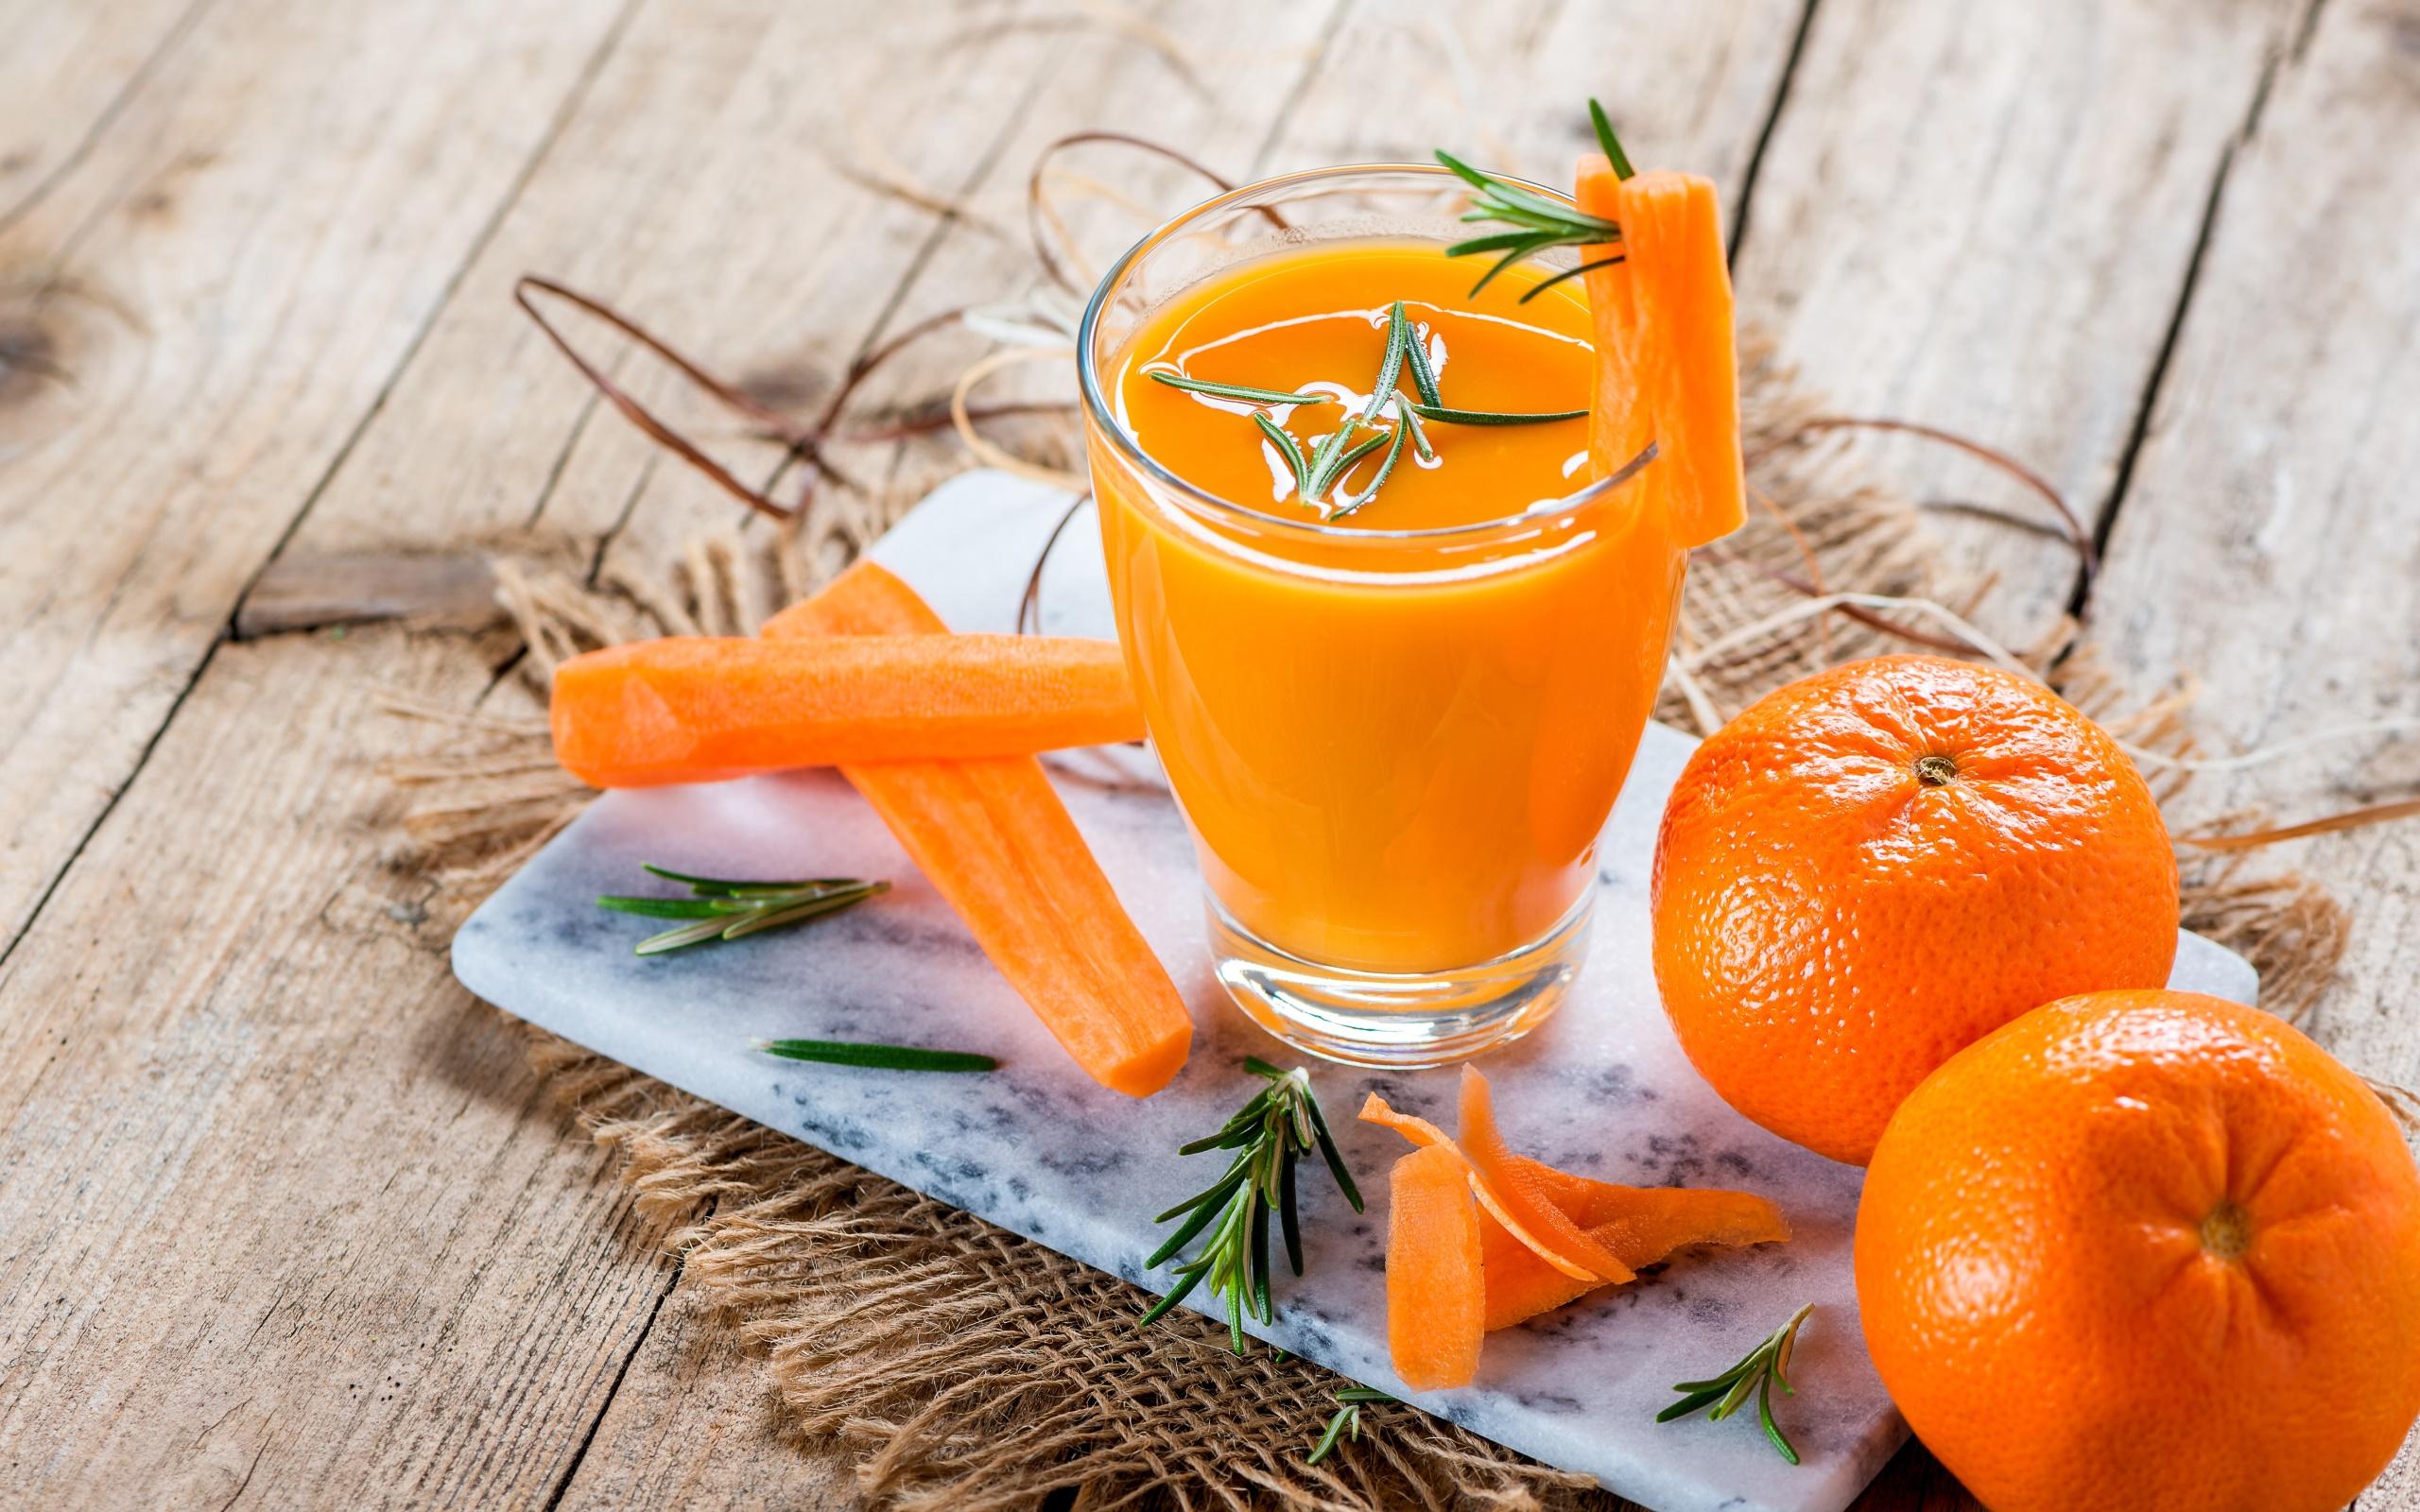 General 2560x1600 food fruit orange (fruit) carrot drink juice rosemary wooden surface